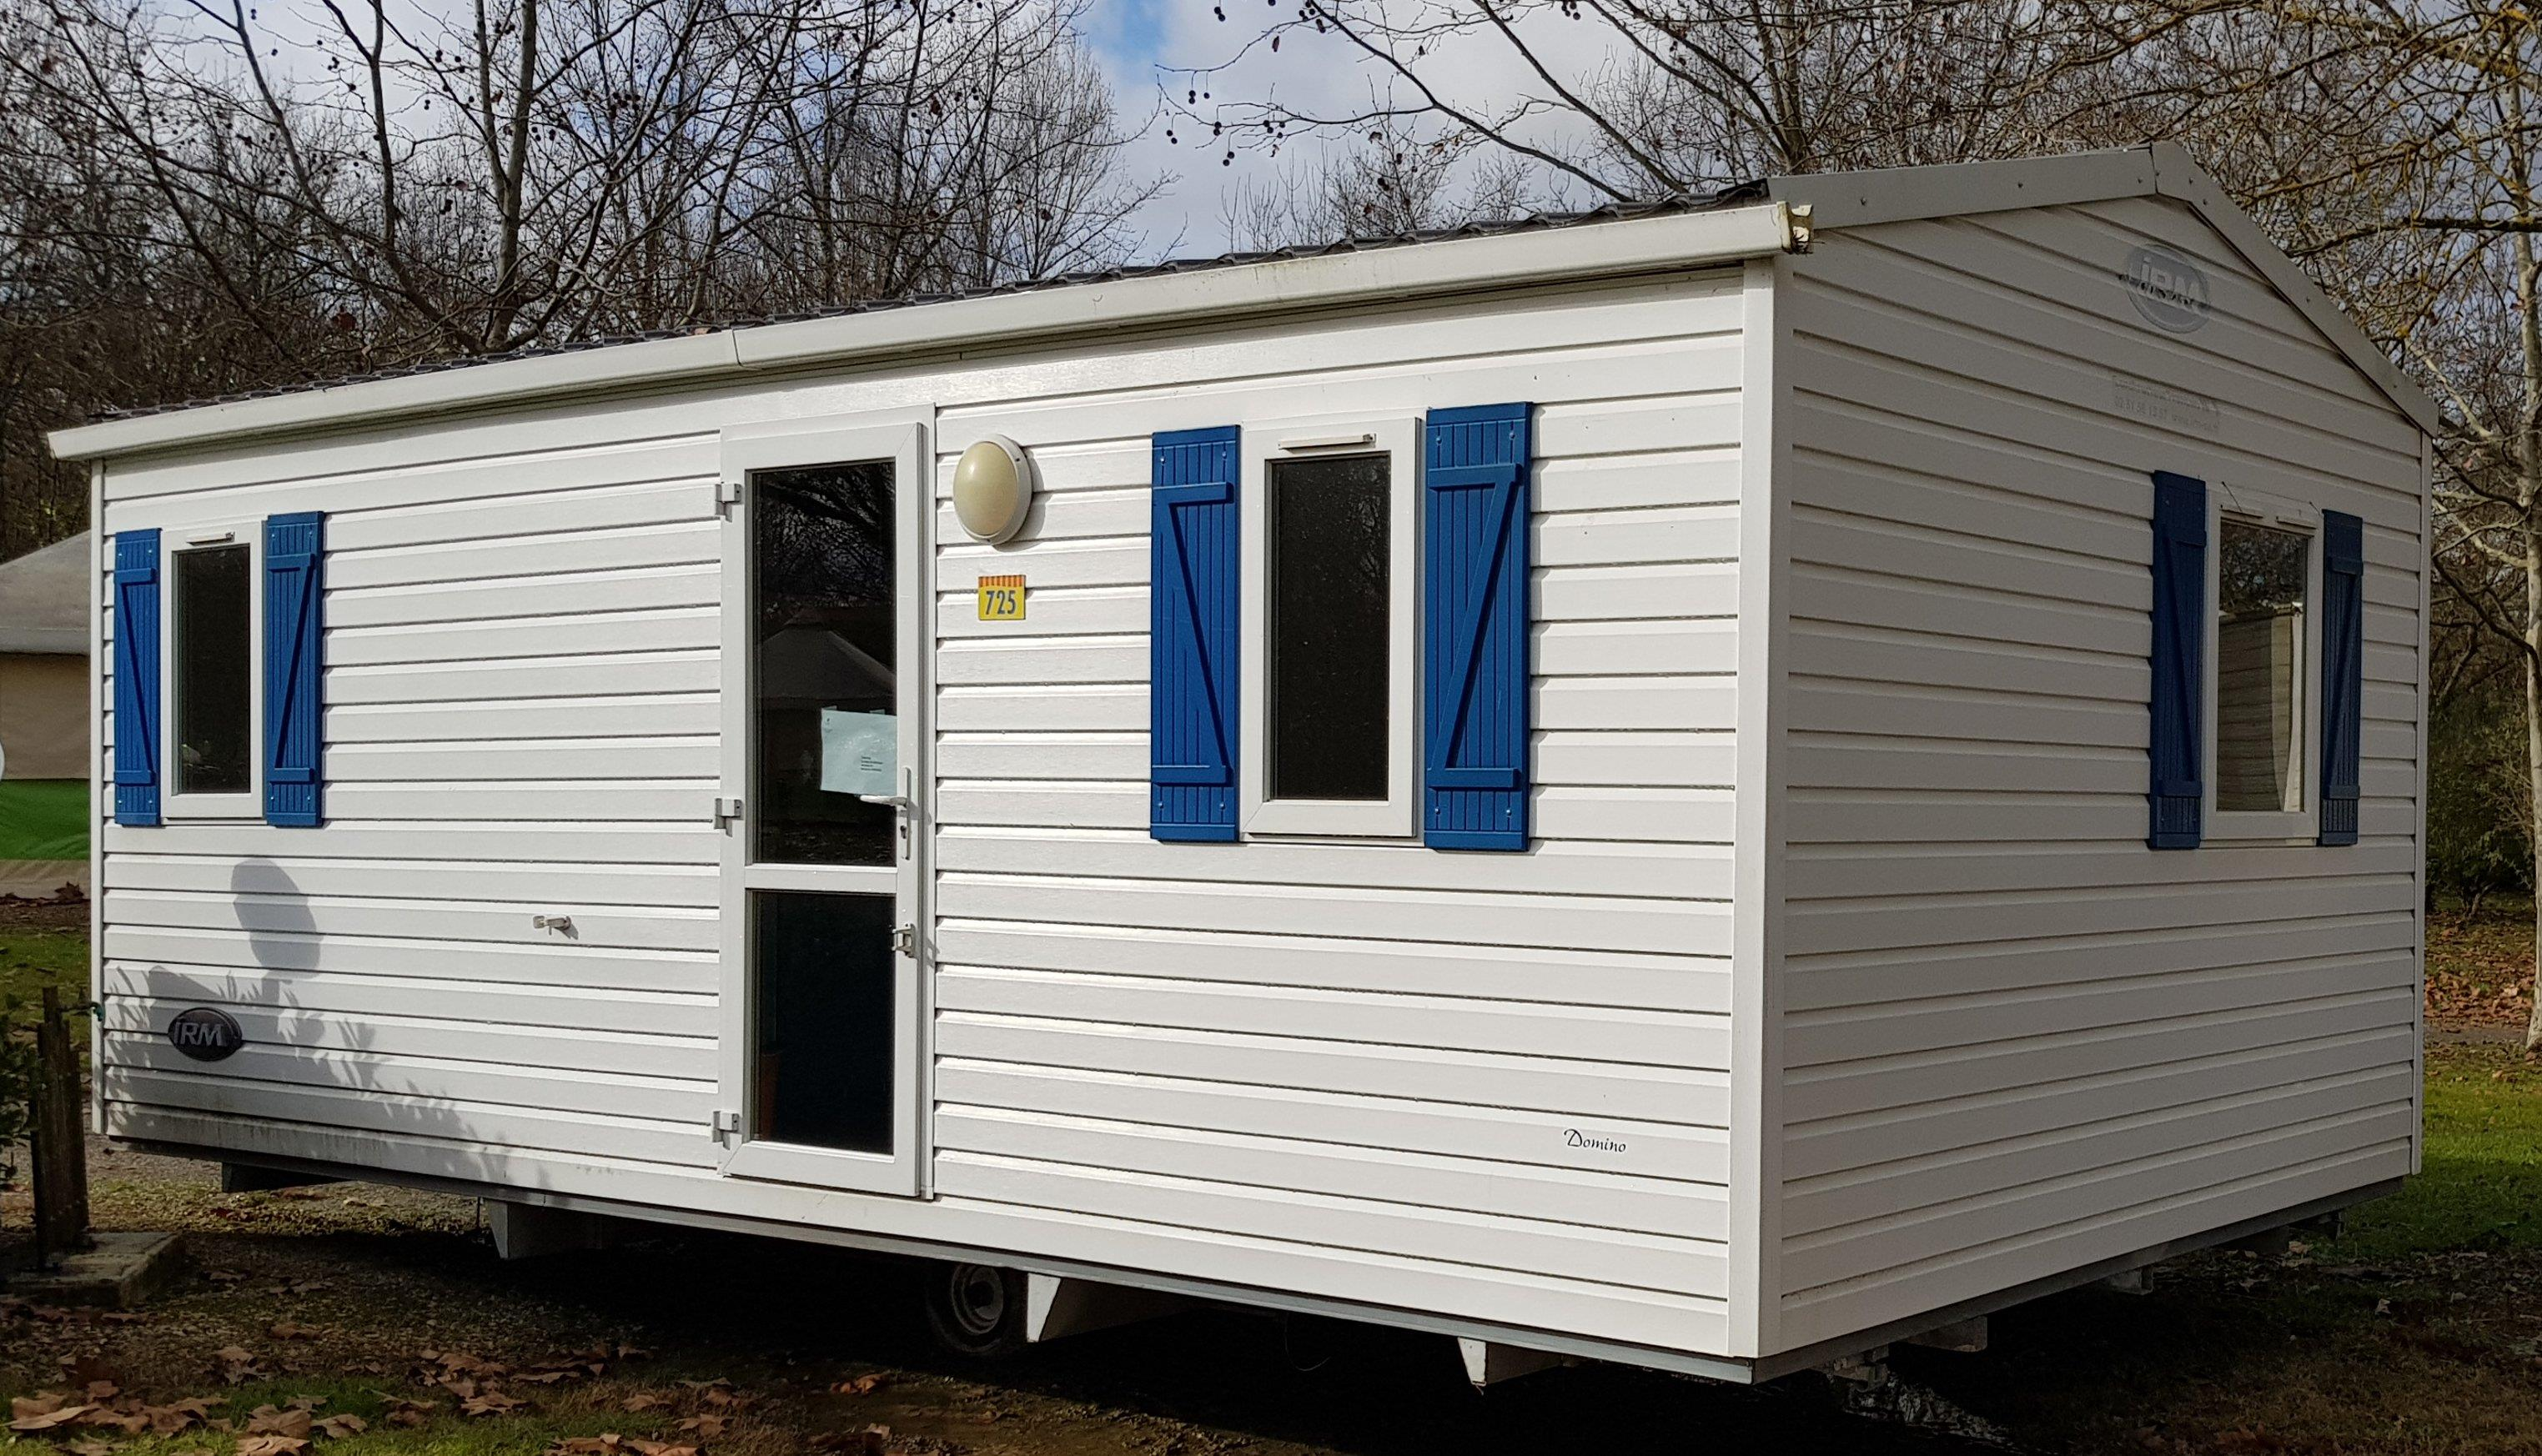 Location - Mobil-Home 2 Chambres Domino Climatisation - Camping La Plage de Verduzan